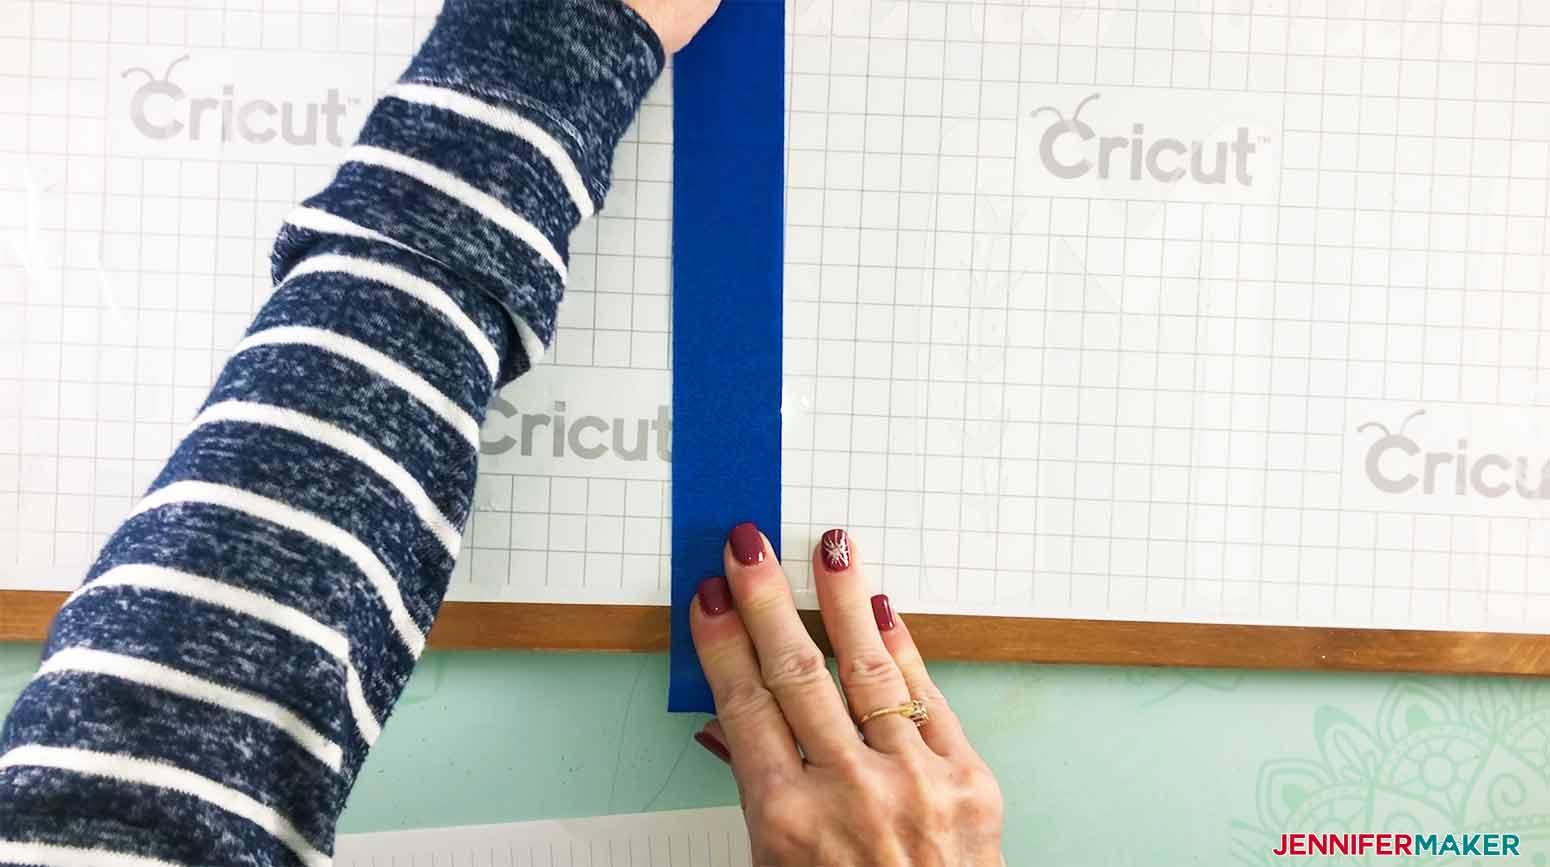 Home-Board-Jennifermaker-palacing-painter-tape-for-hinge-method-application